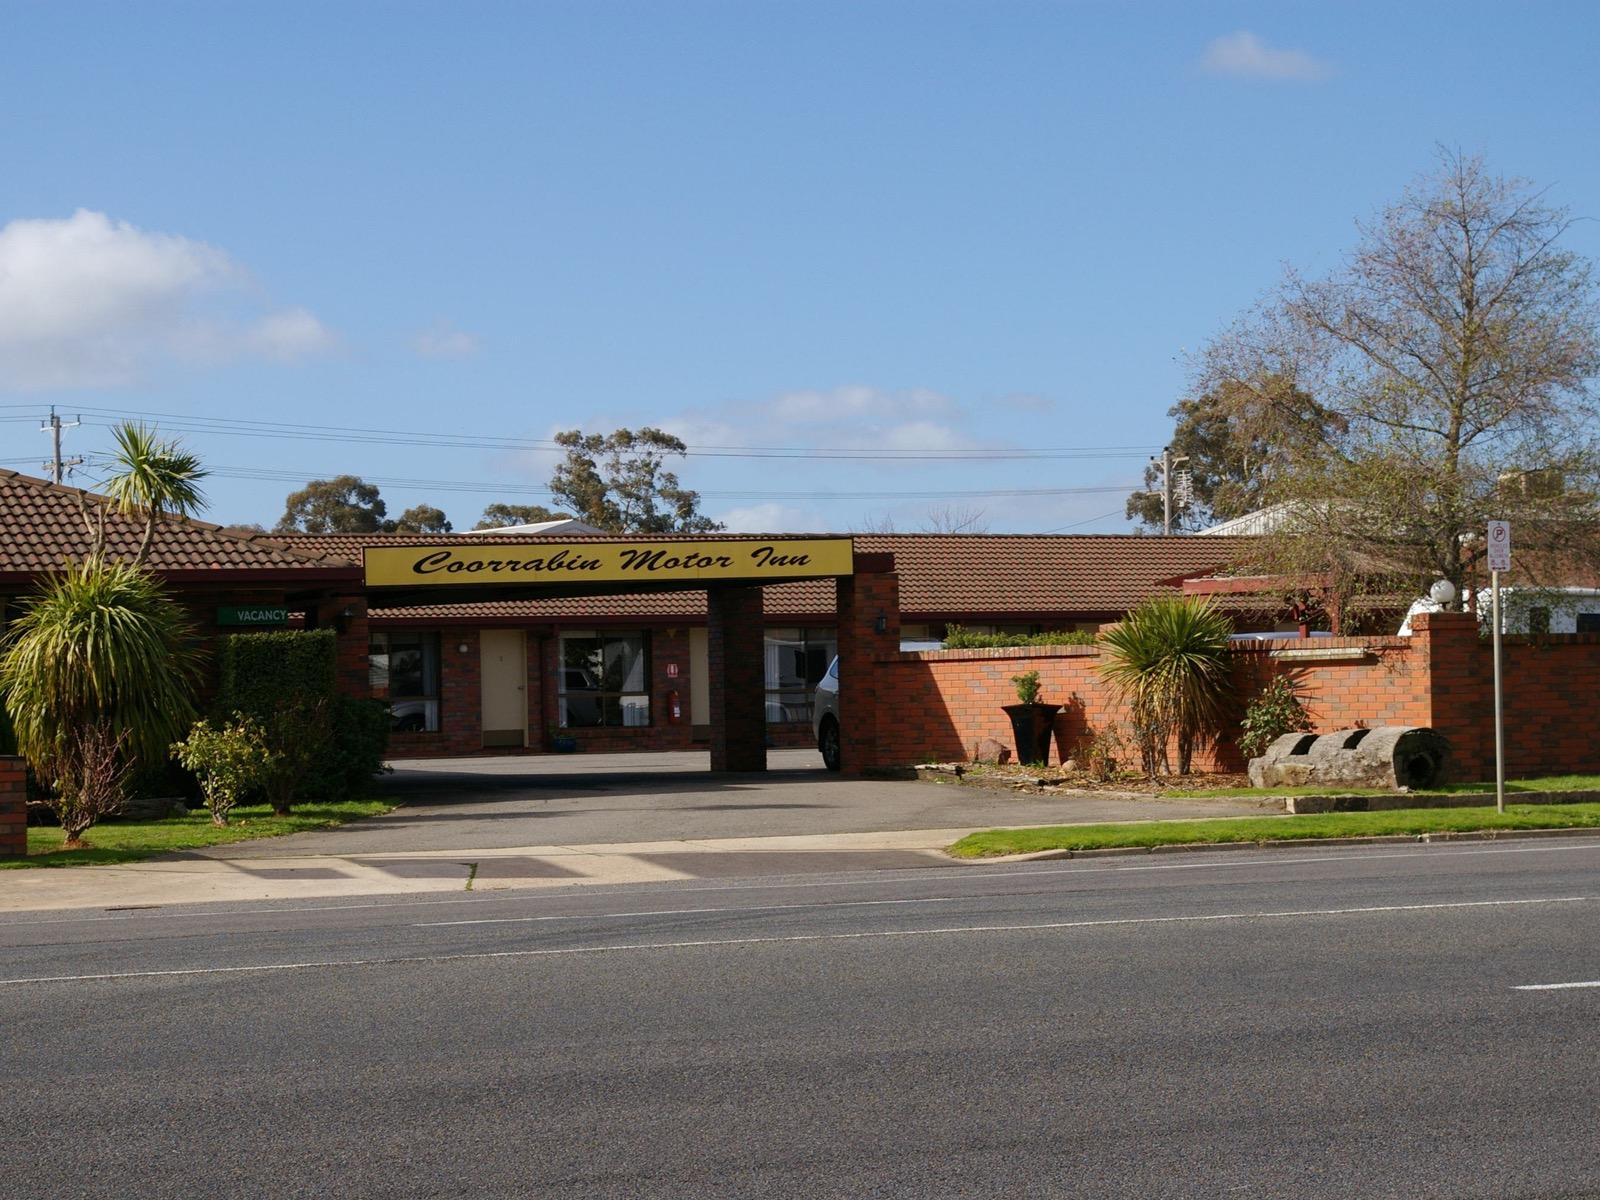 Coorrabin Motor Inn